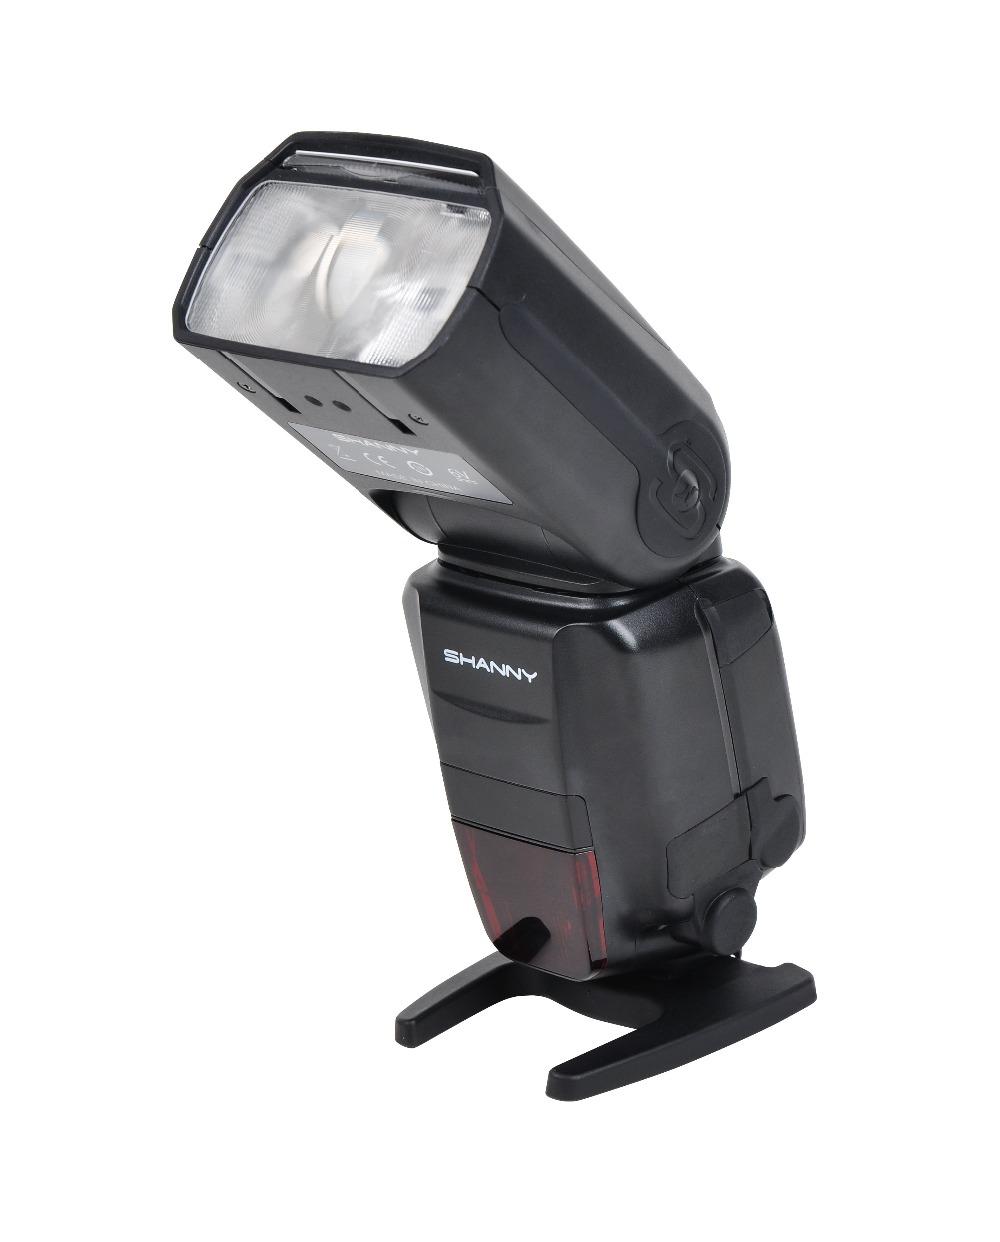 Shanny SN600N HSS 1/8000S i-TTL GN60 Flashgun Flash Speedlite for Nikon D750 D800 D5200 D5300 D800 D600 D610 D7200 D7100<br><br>Aliexpress